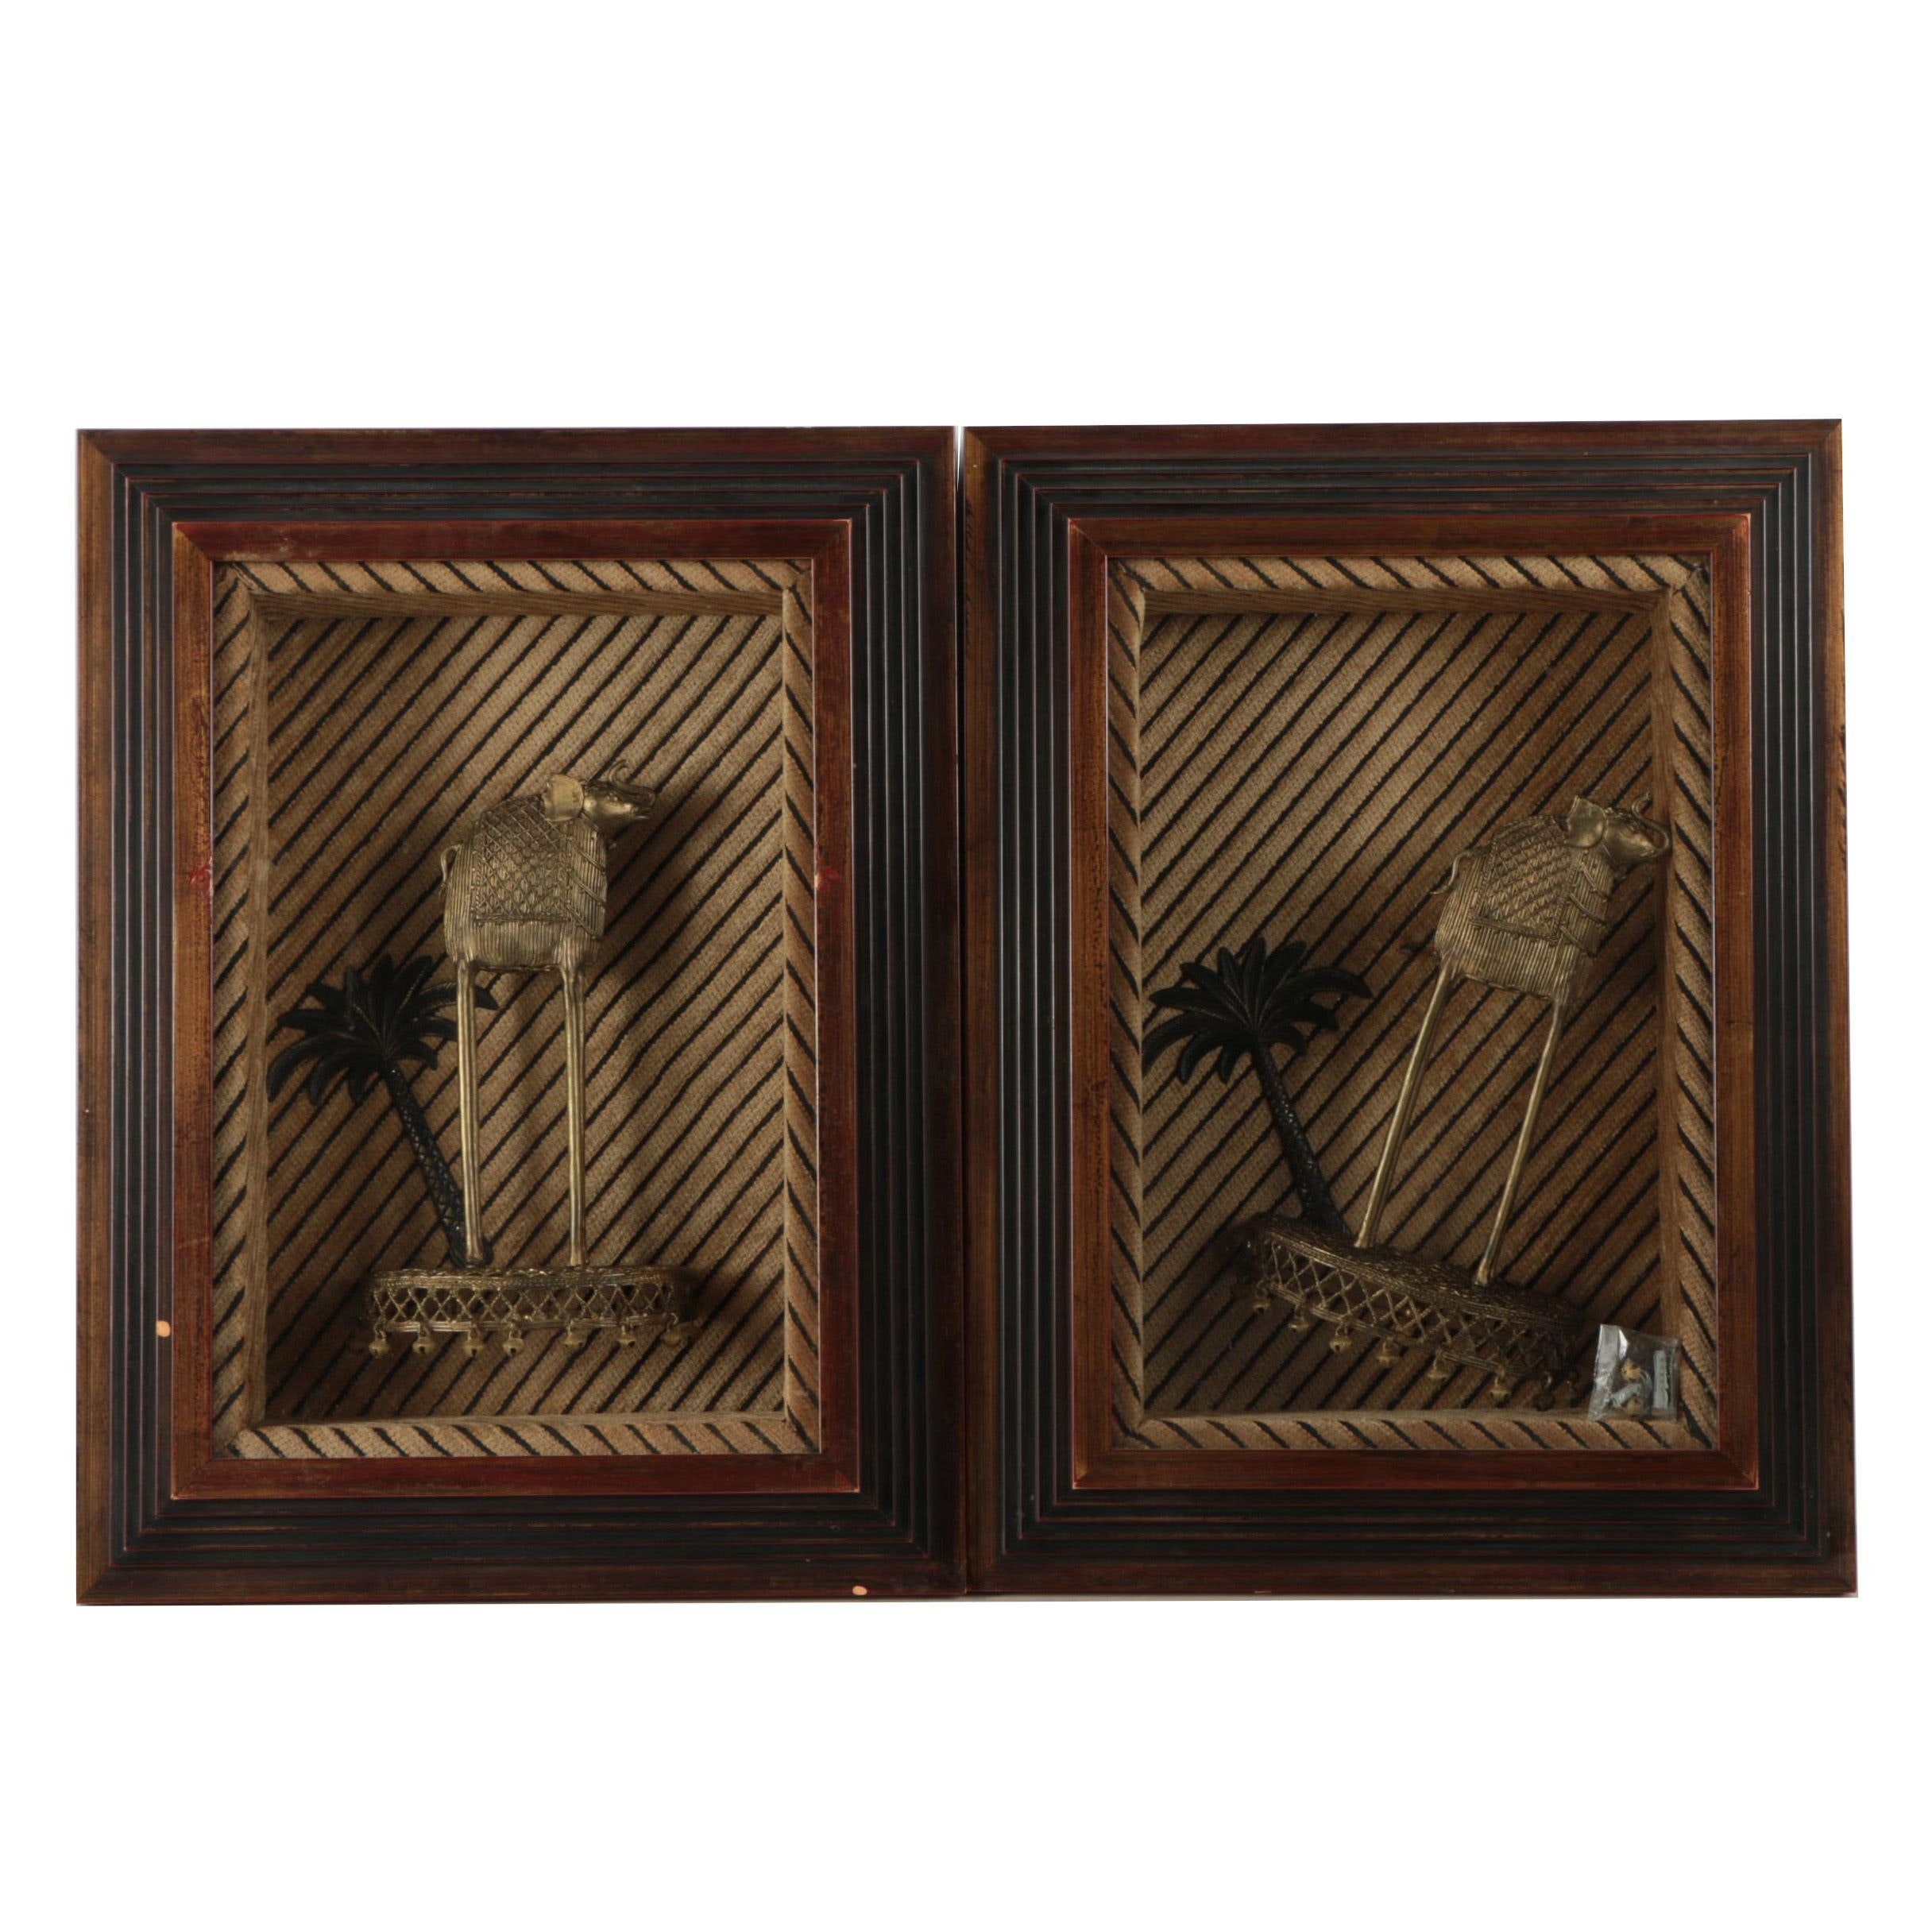 Pair of John Richard Framed Metal Elephants with Palm Trees